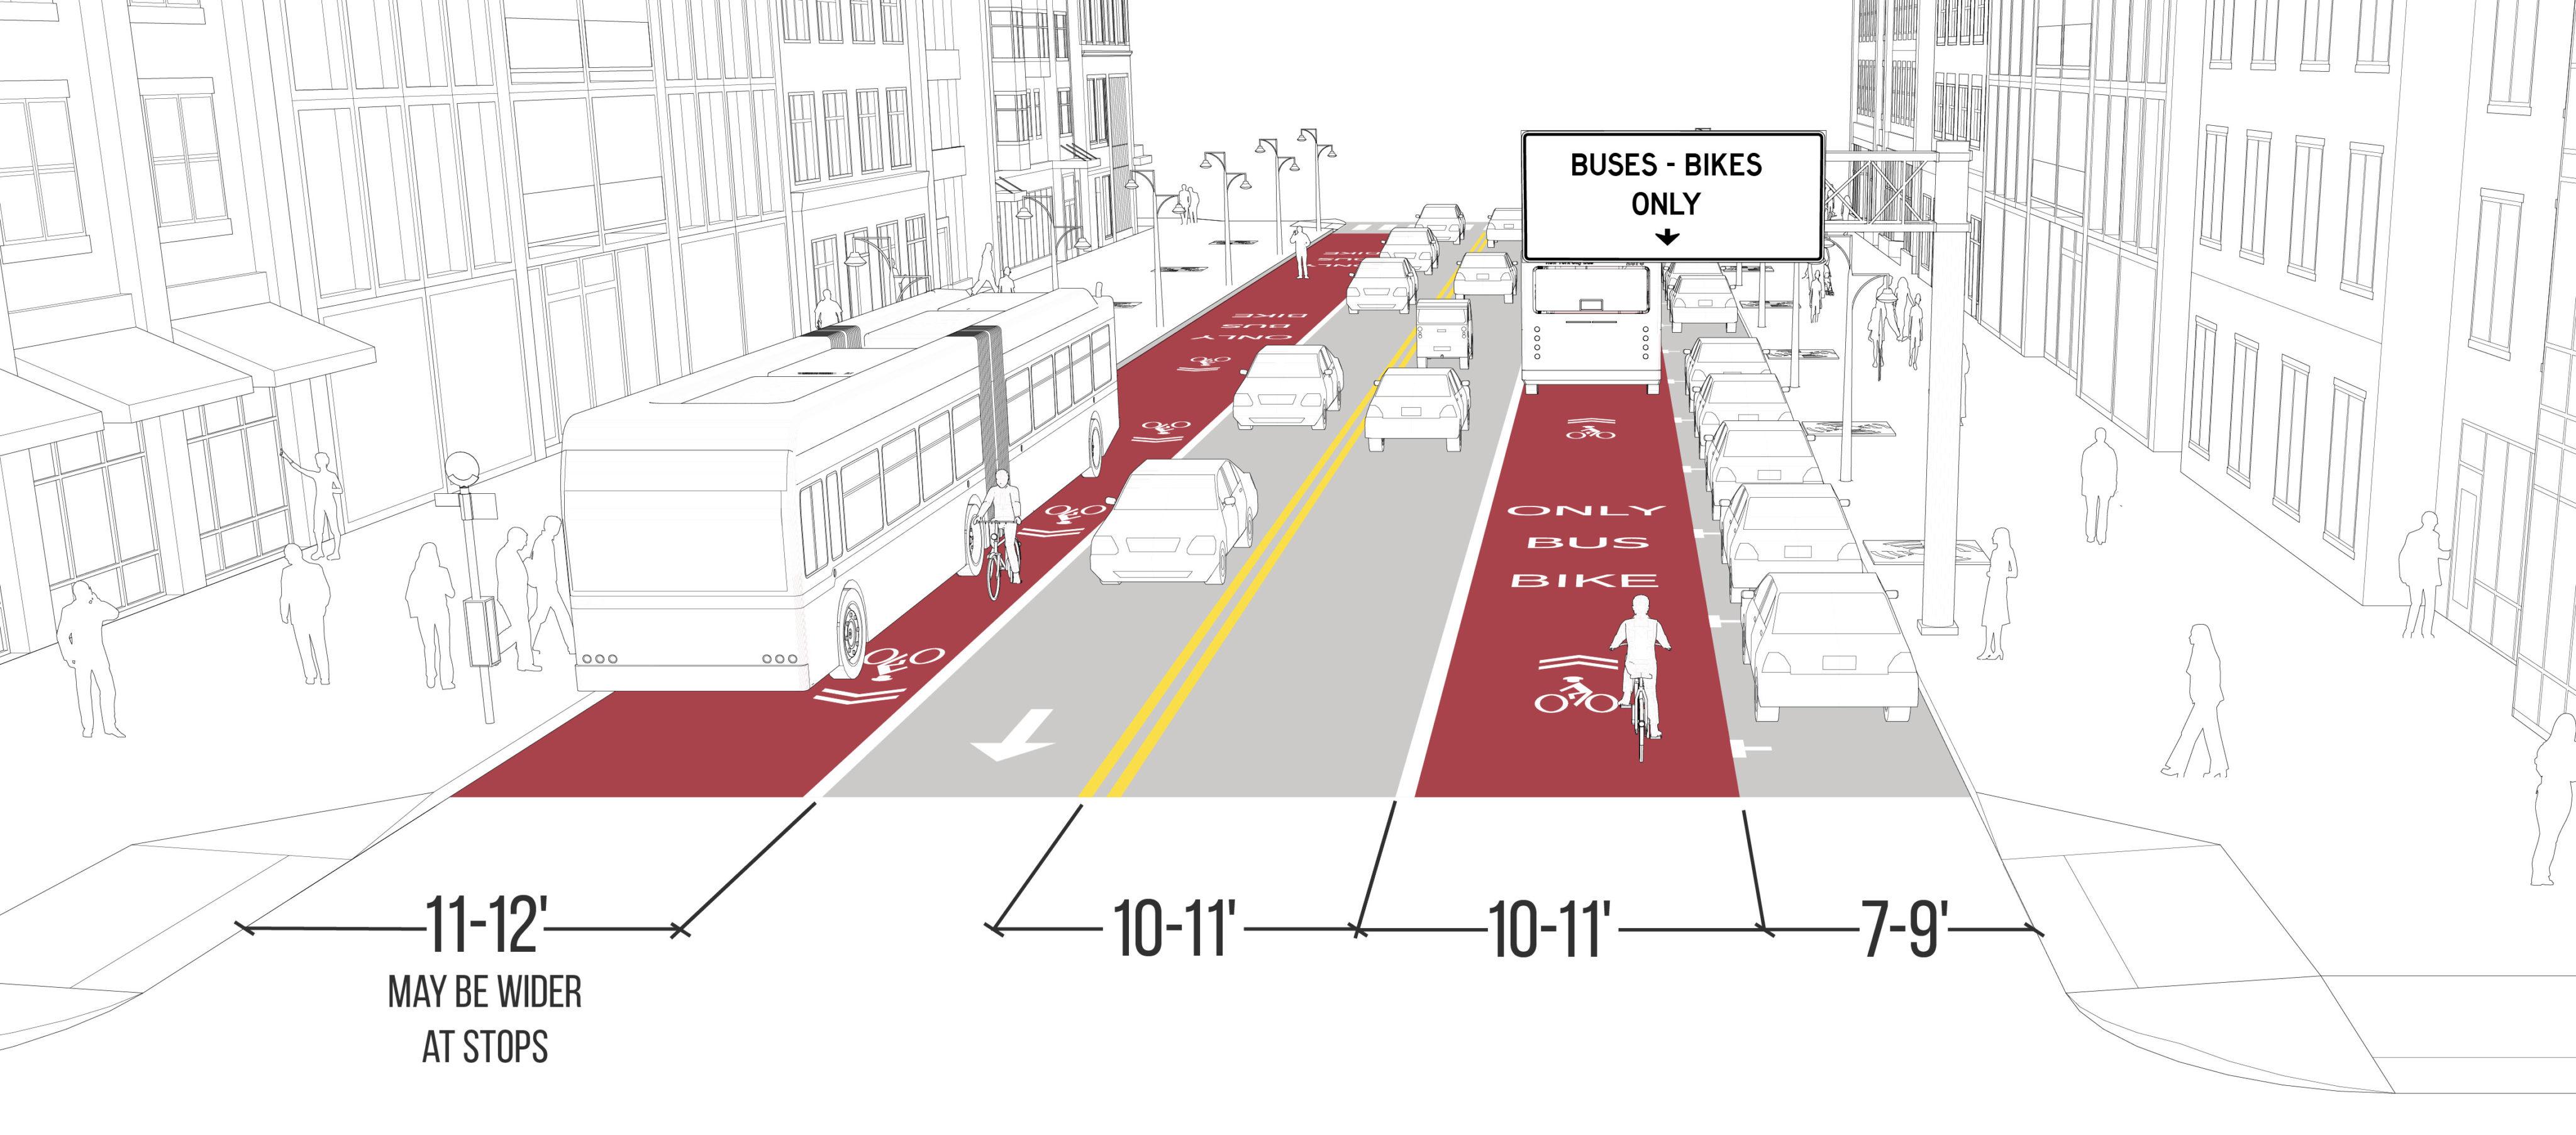 Shared Bus-Bike Lane | National Association of City Transportation